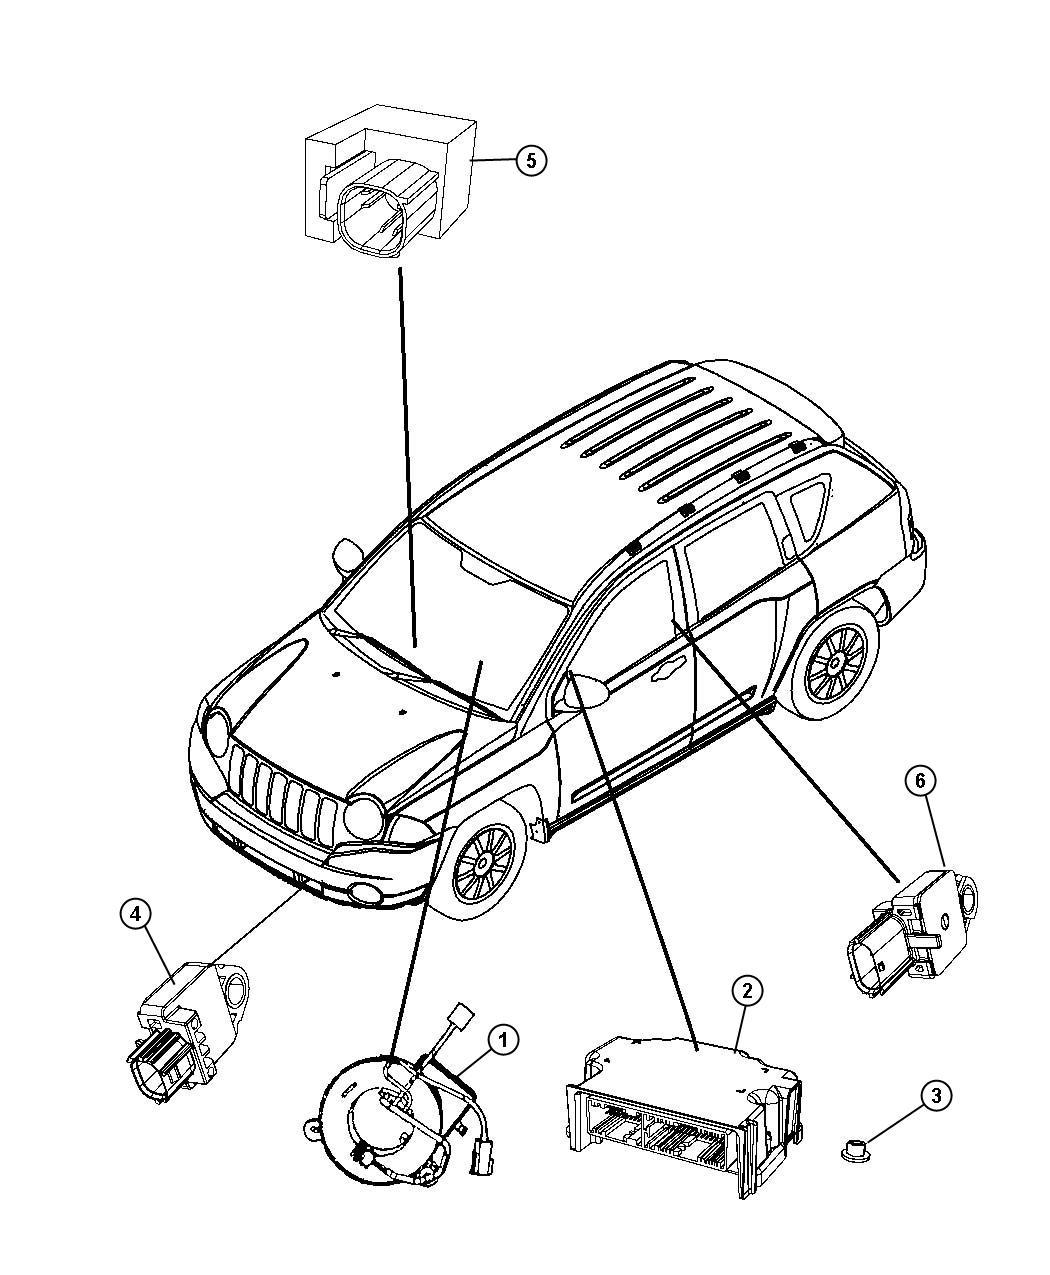 Dodge Caliber Air Bag Modules Impact Sensors And Clock Spring